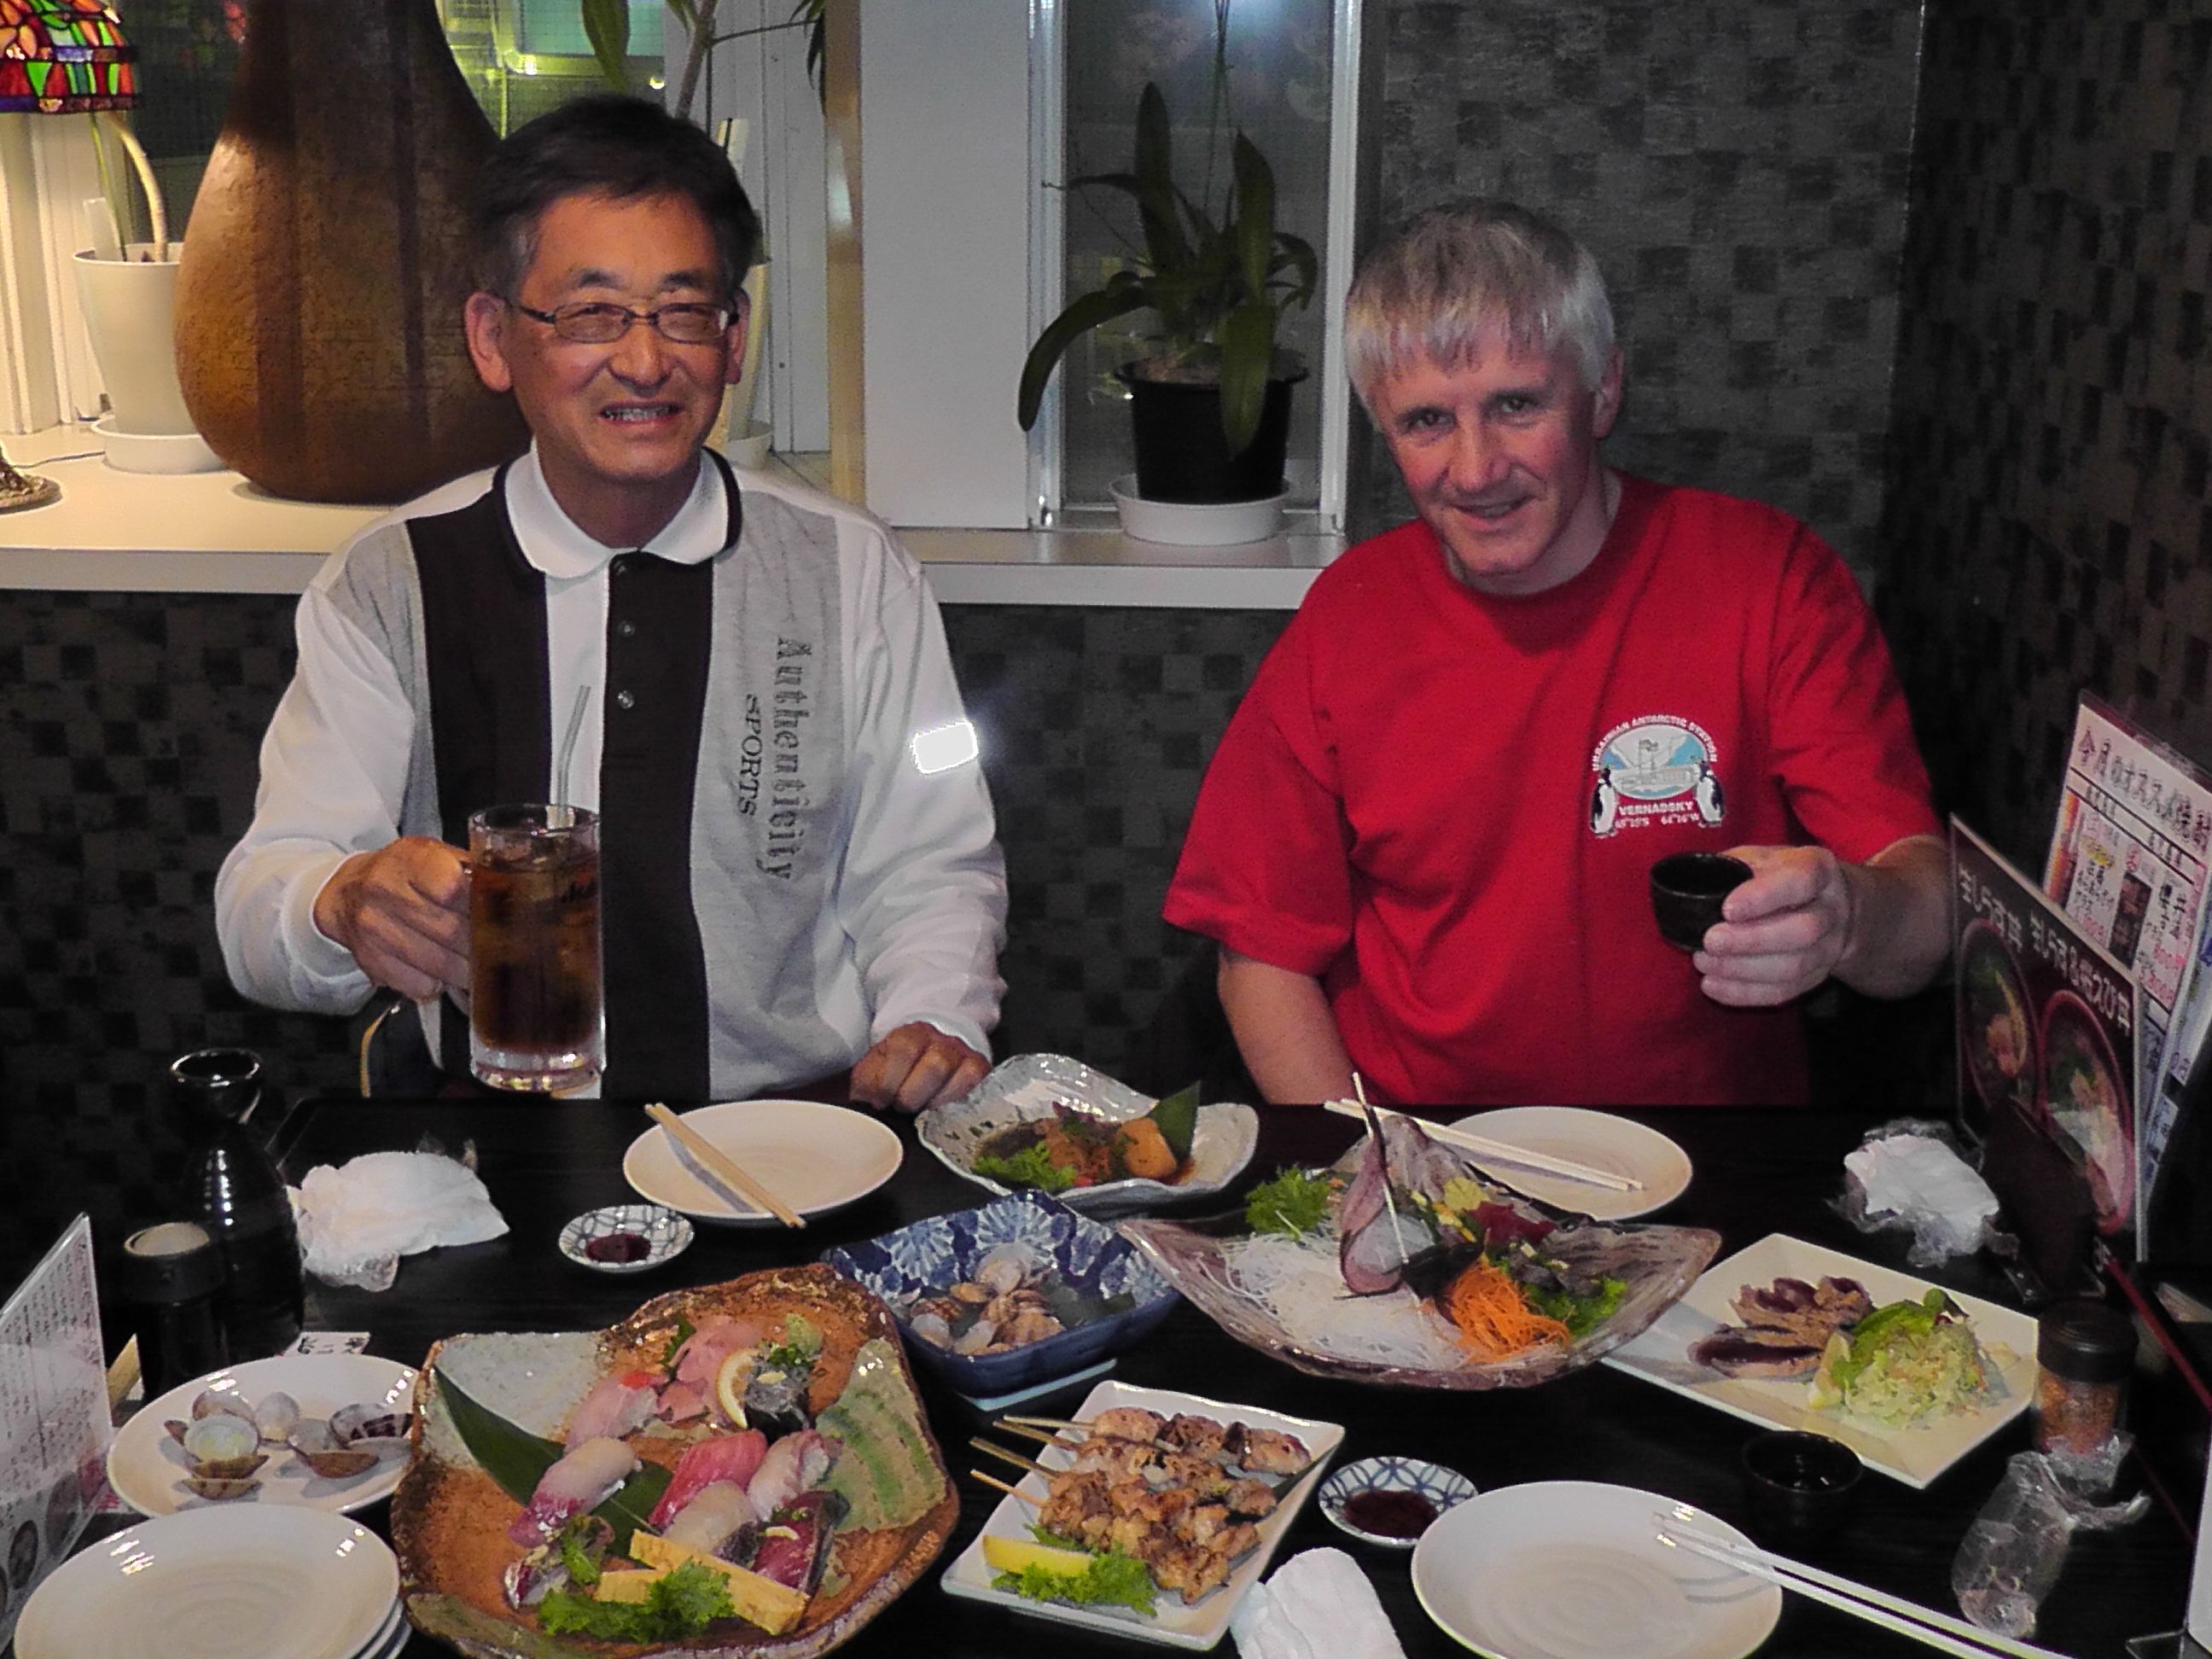 Нажмите на изображение для увеличения.  Название:Japan_2014_Roman_UT7UA_Takashi_Ajiro_JA2JPA_dinner.JPG Просмотров:116 Размер:2.05 Мб ID:119190